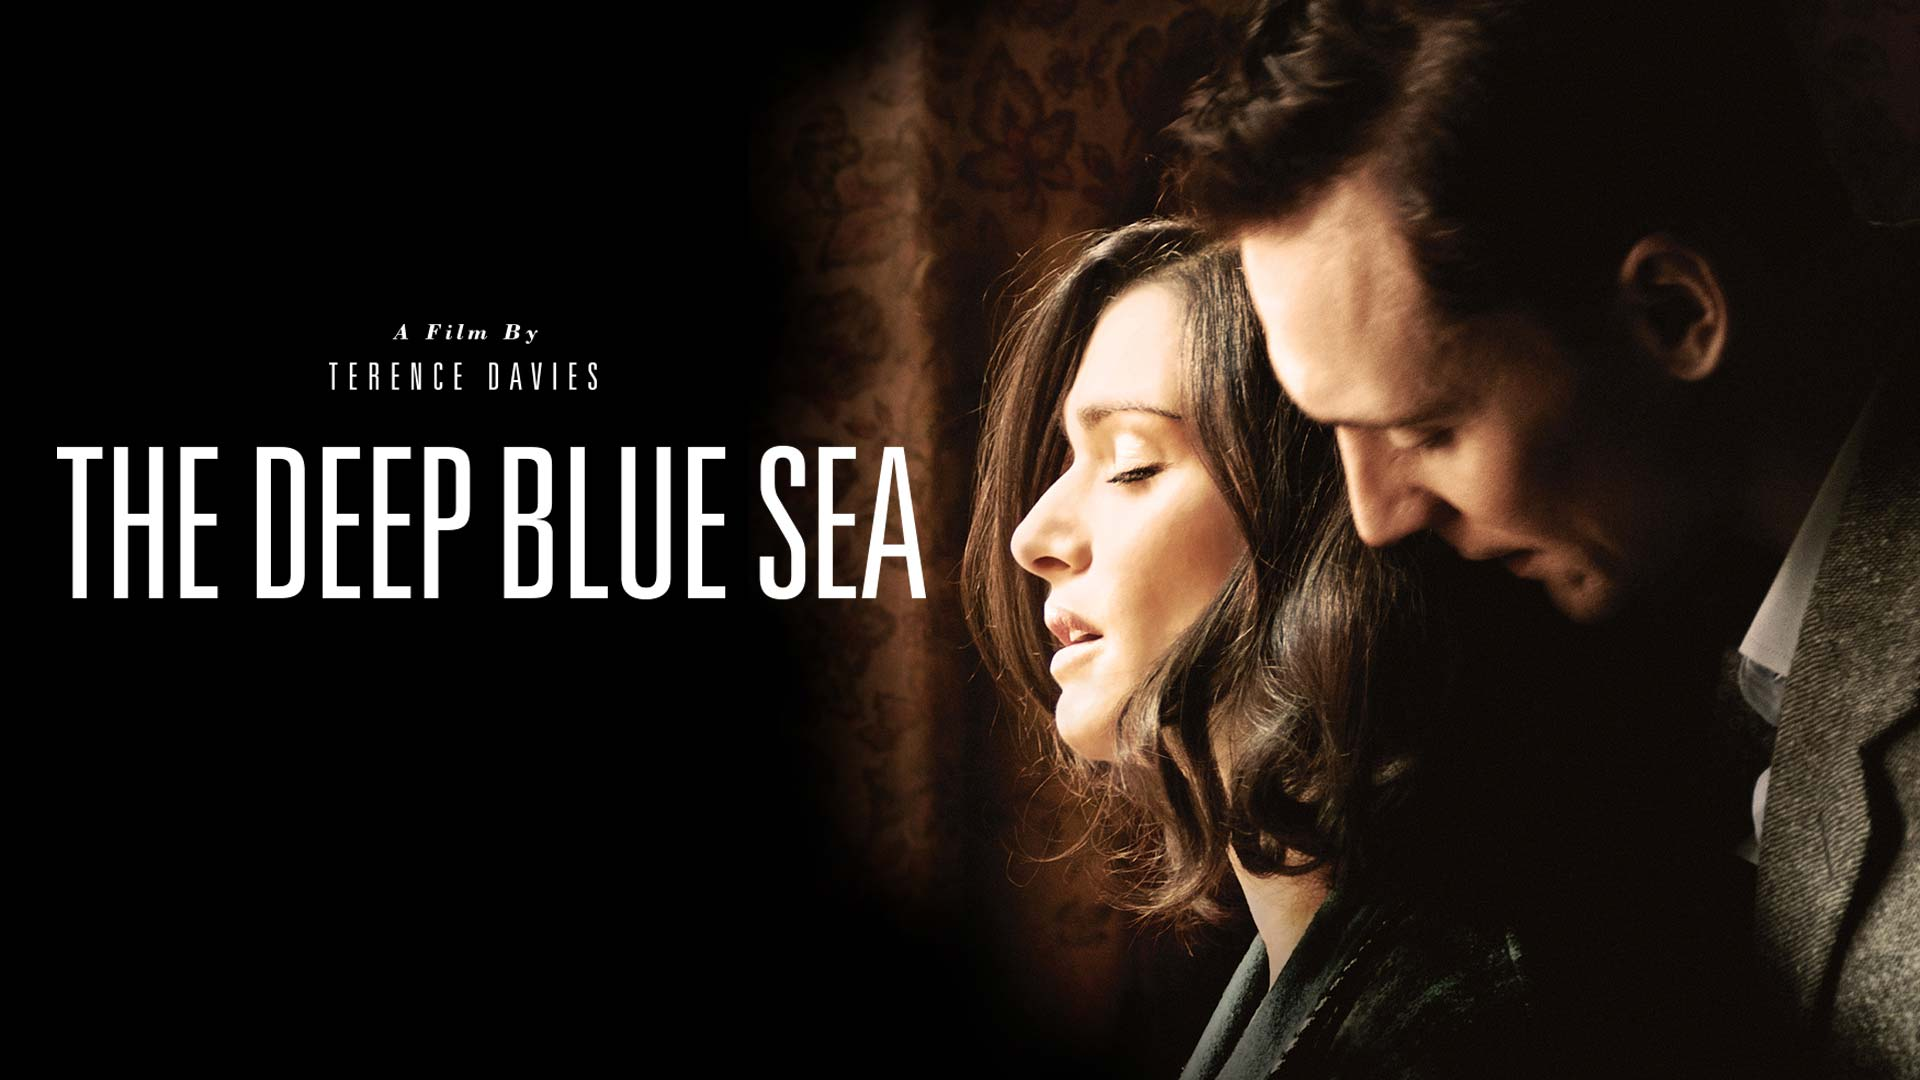 The Deep Blue Sea - image